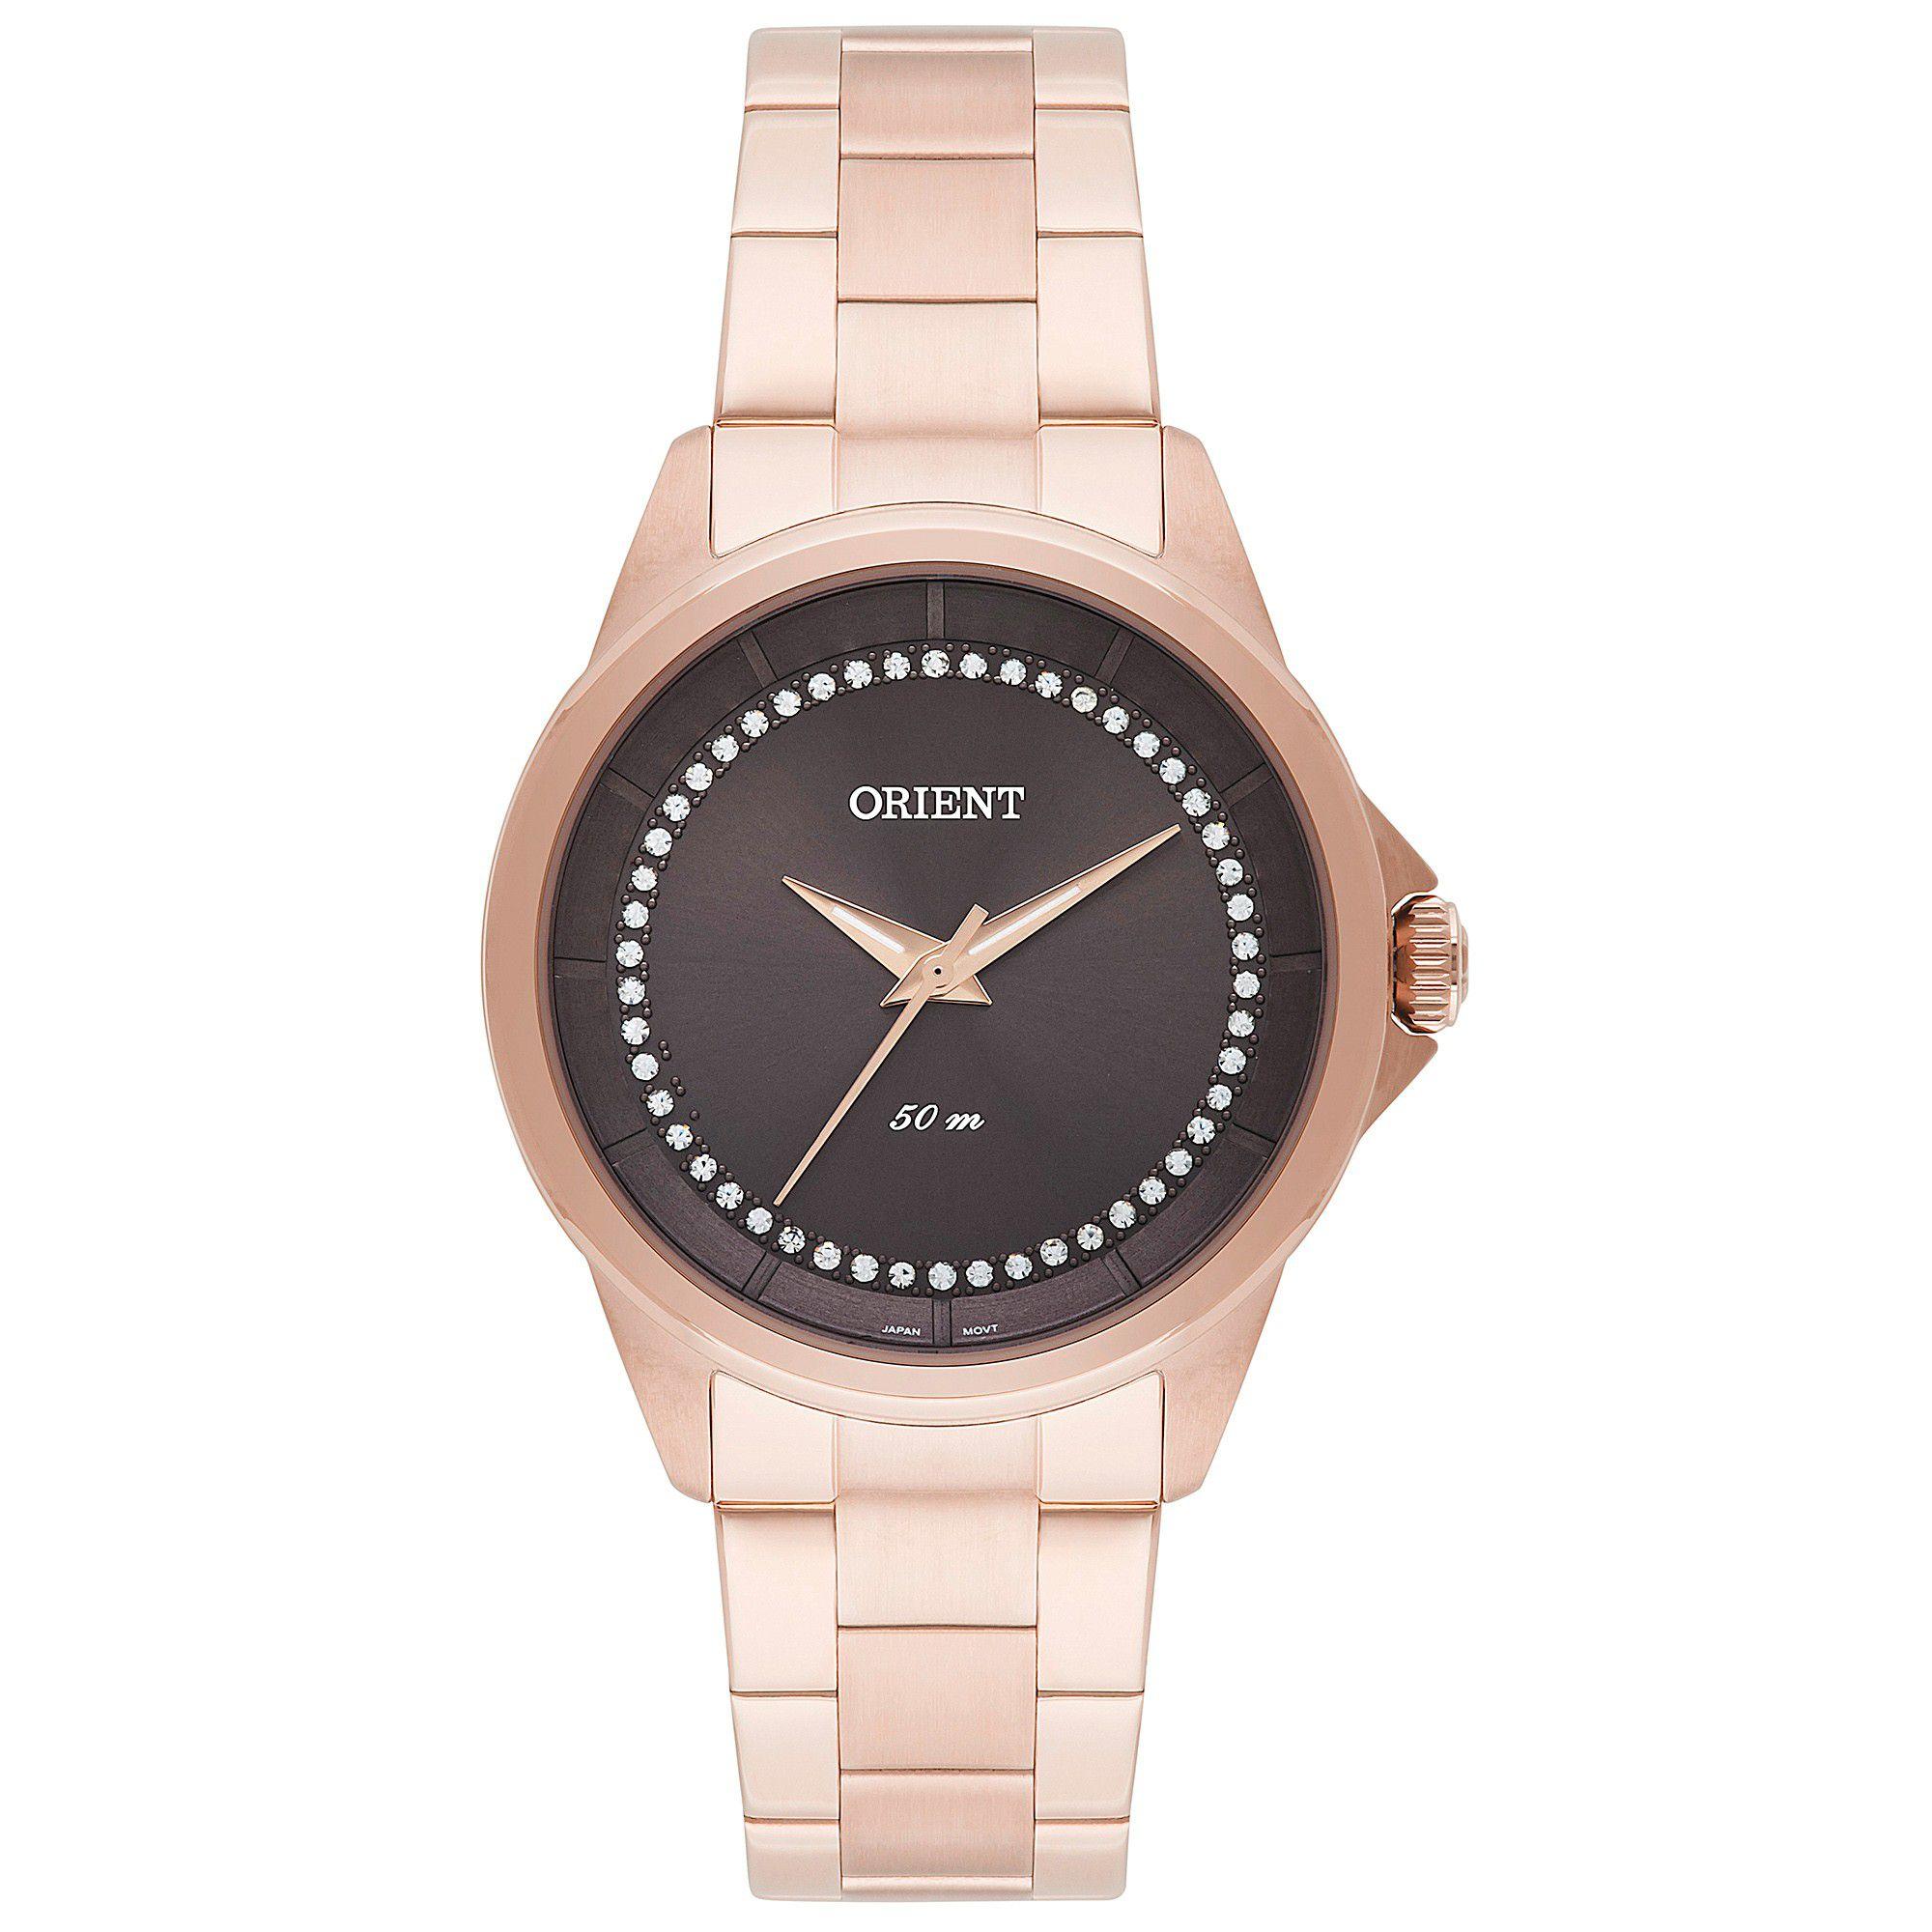 Relógio Feminino Orient FRSS0014 G1RX